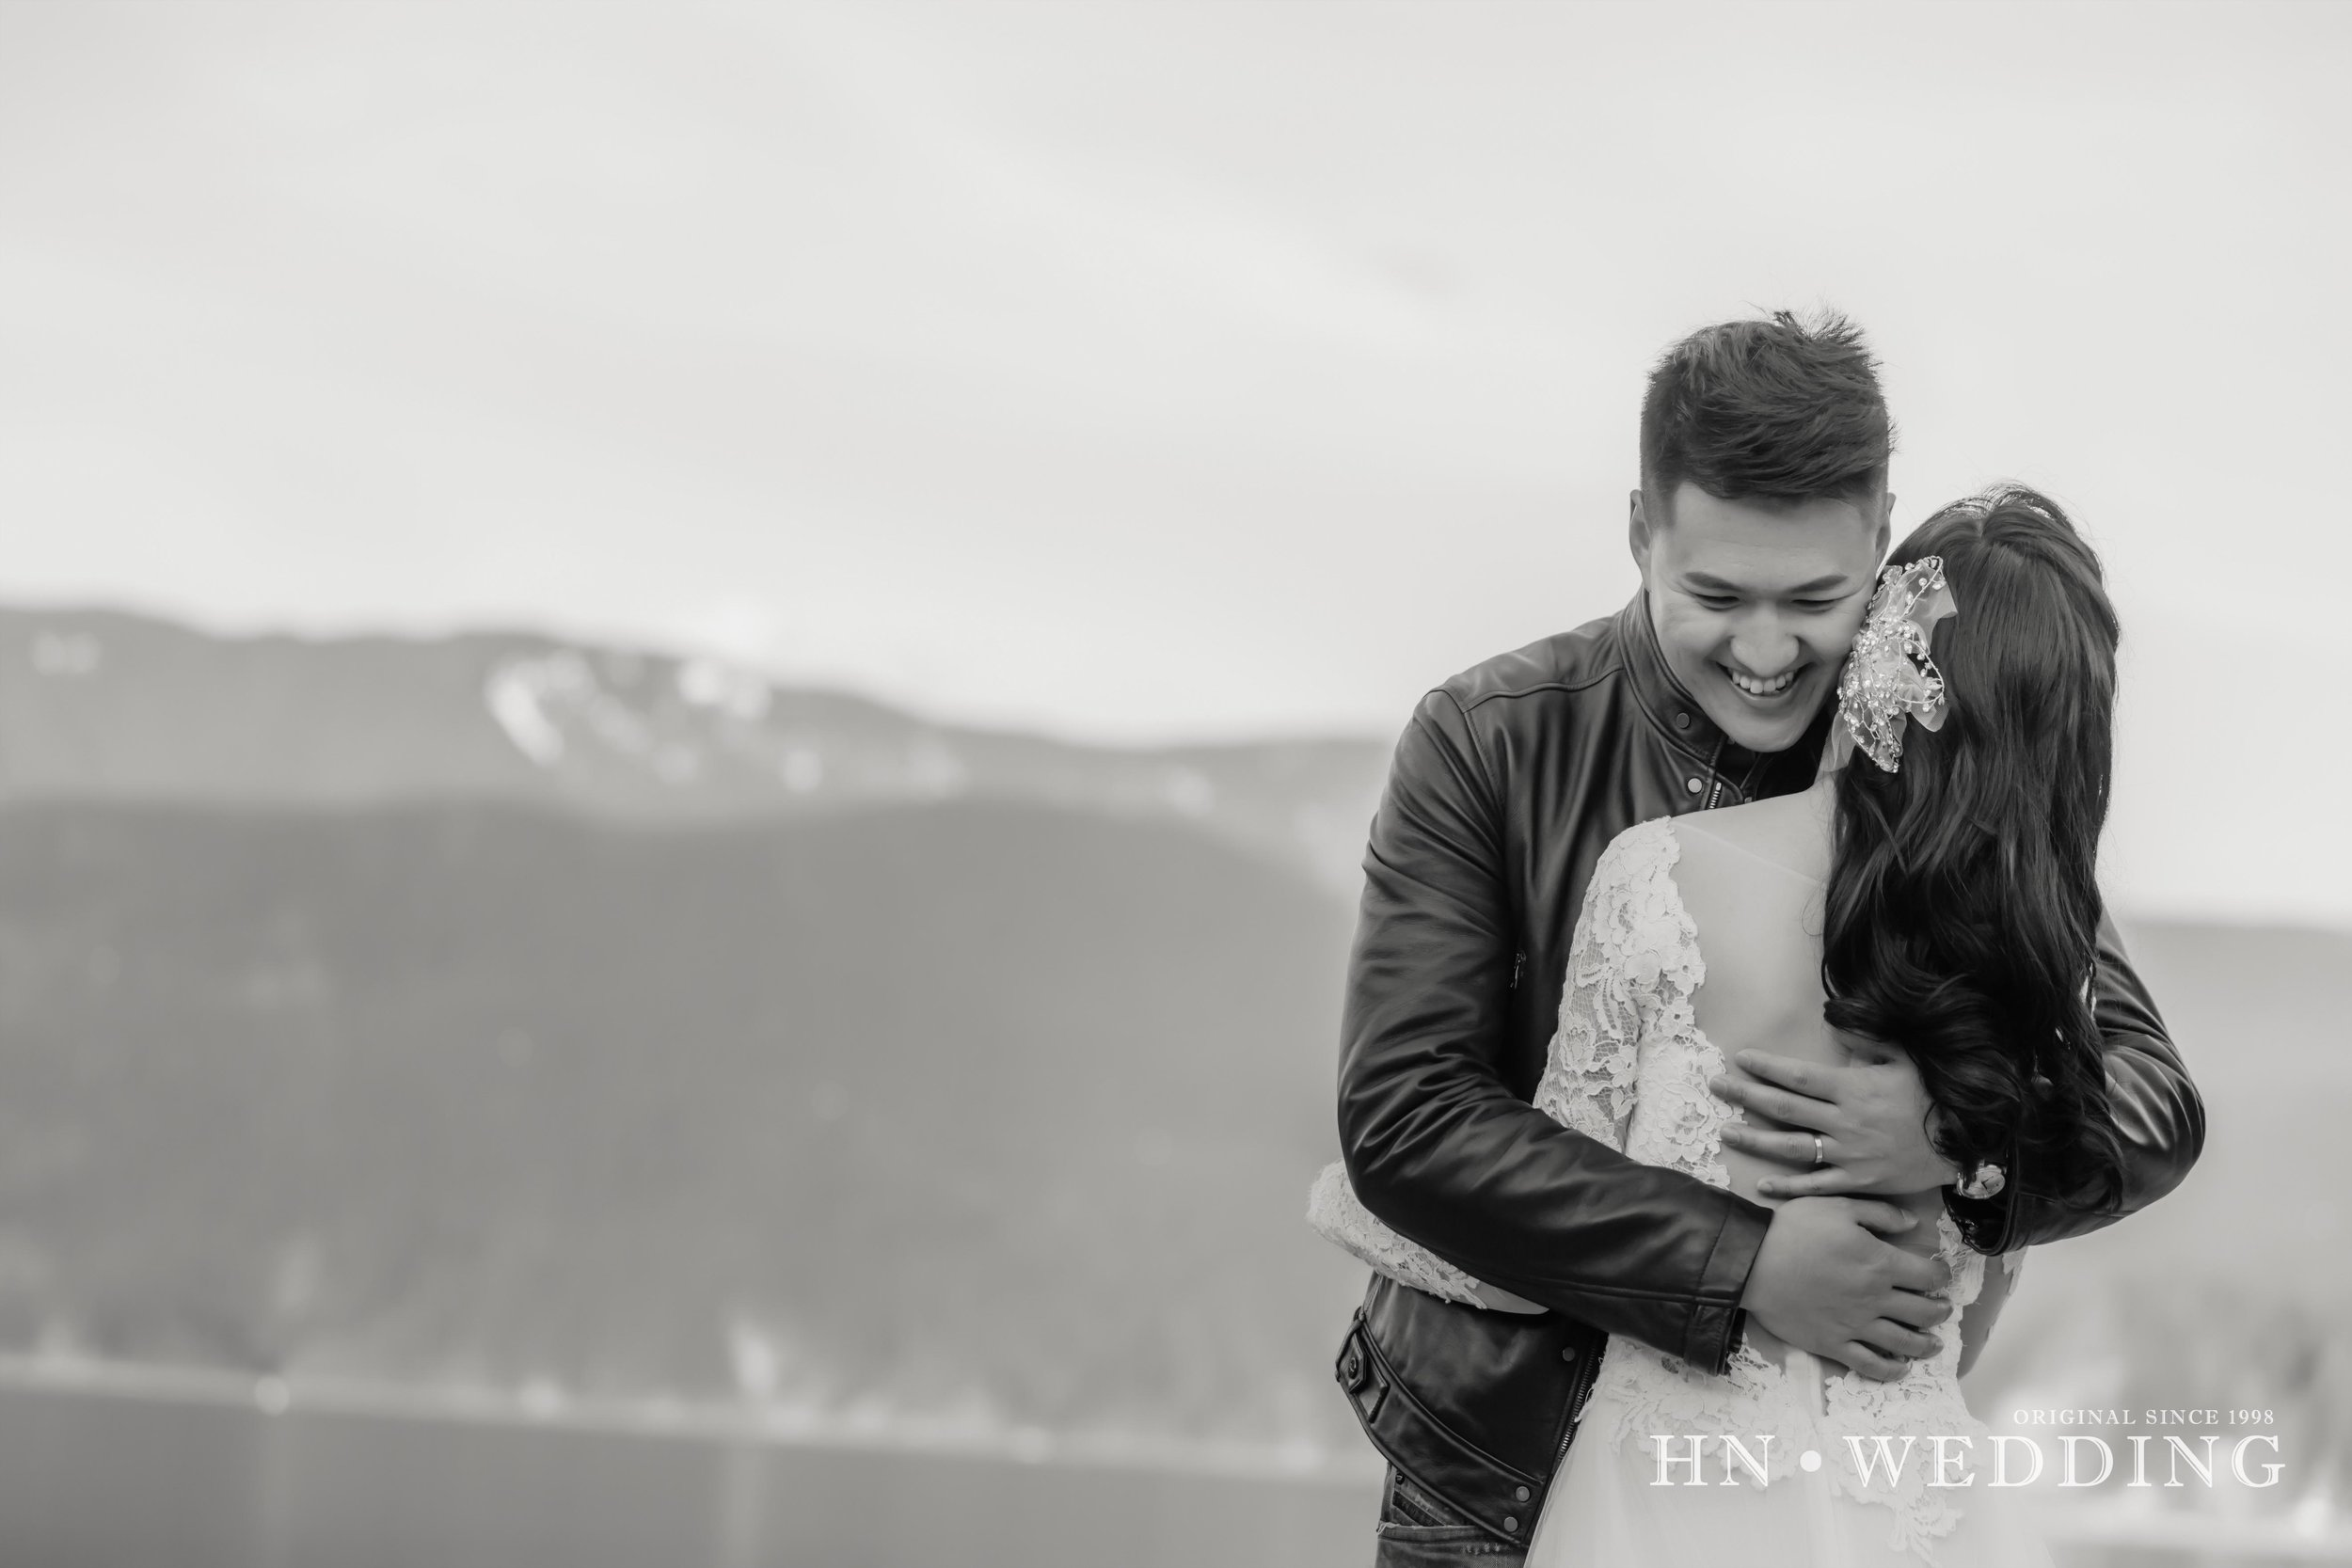 HNwedding-20170403-prewedding-0197.jpg